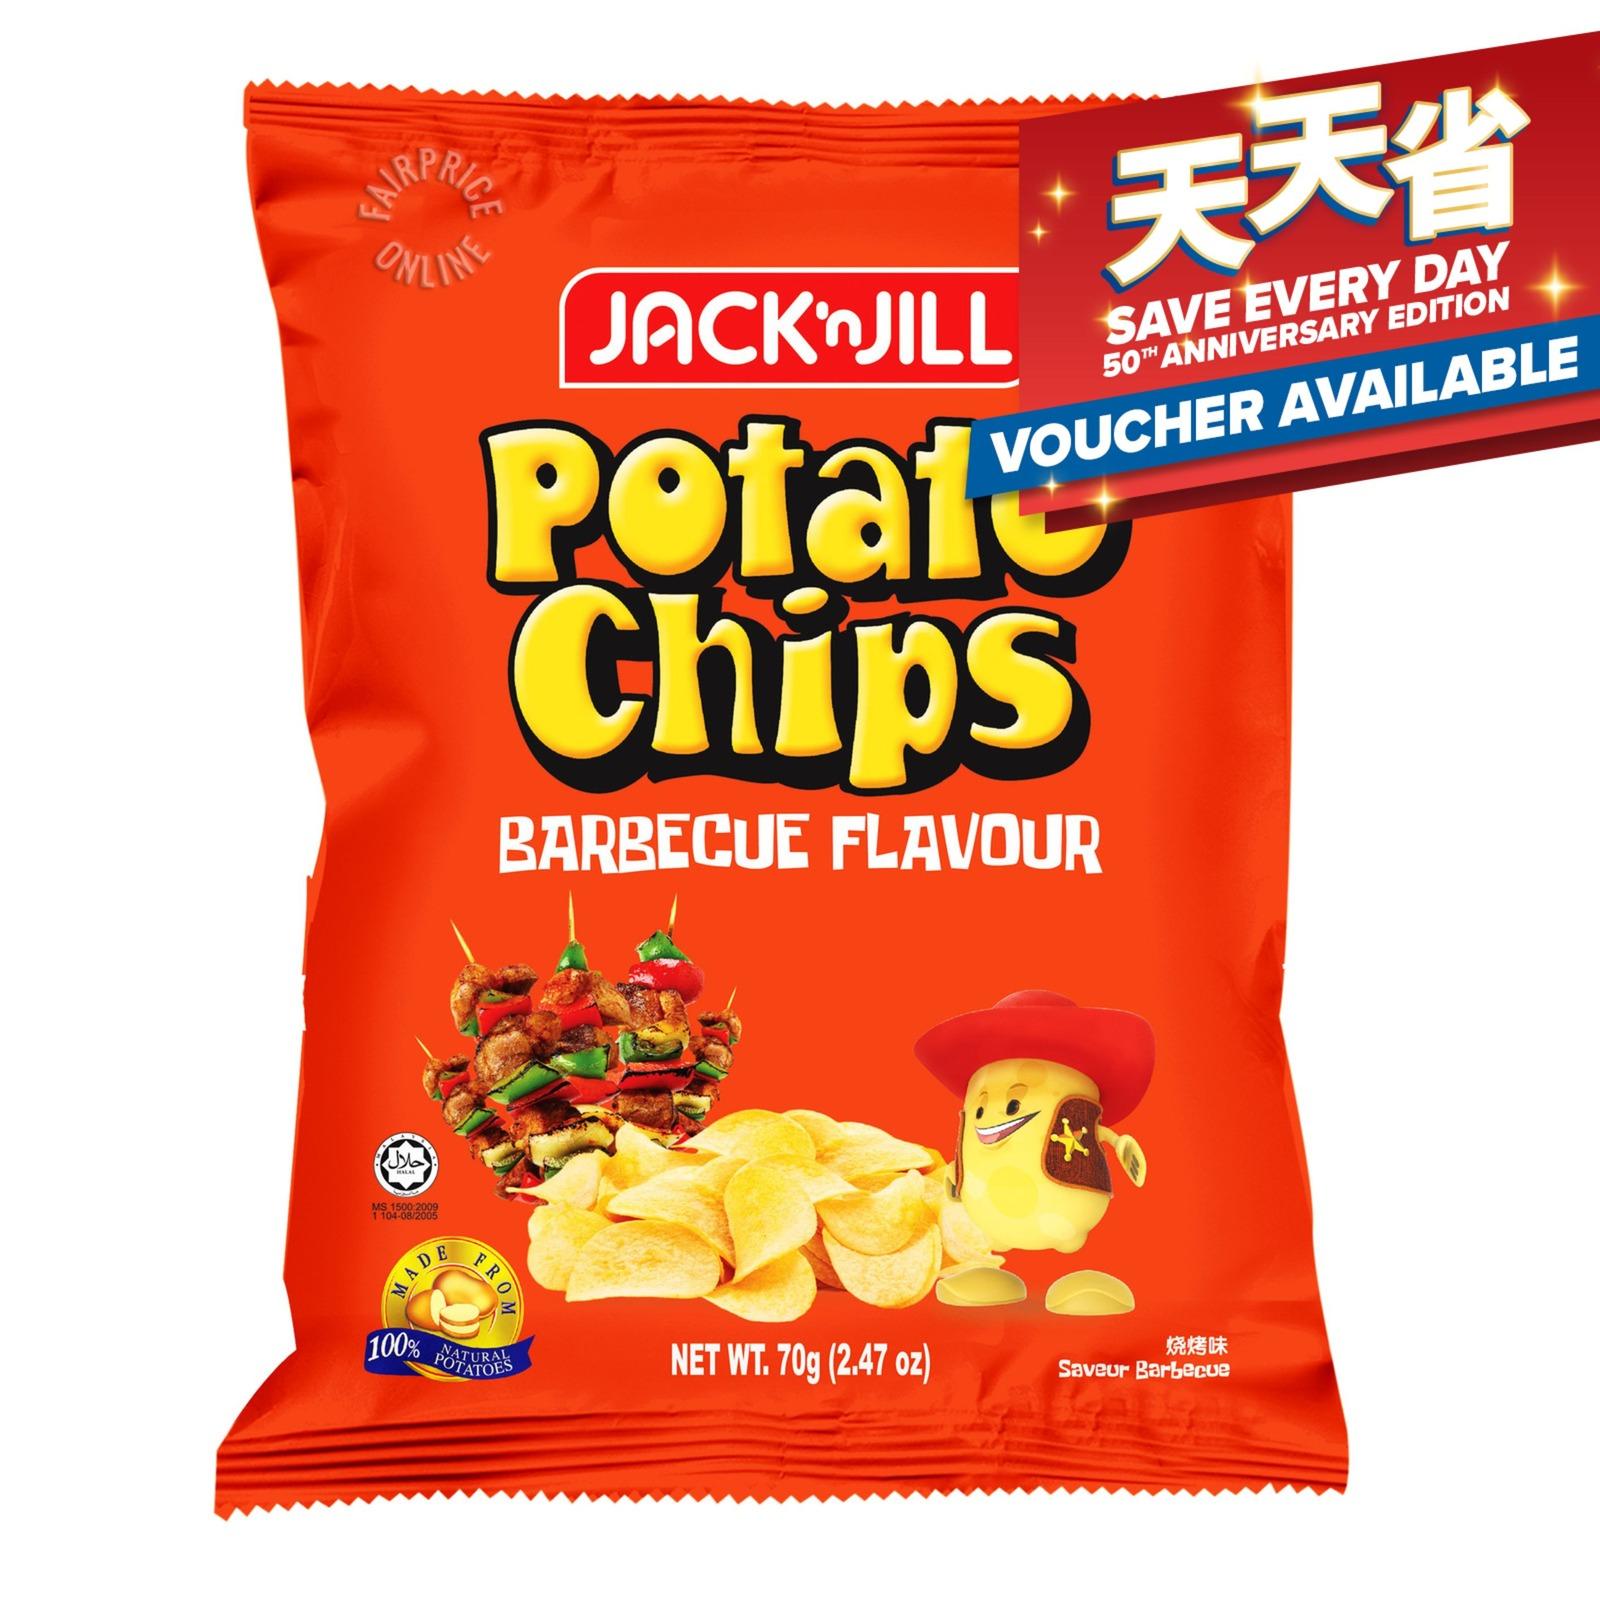 Jack 'n Jill Potato Chips - Barbecue